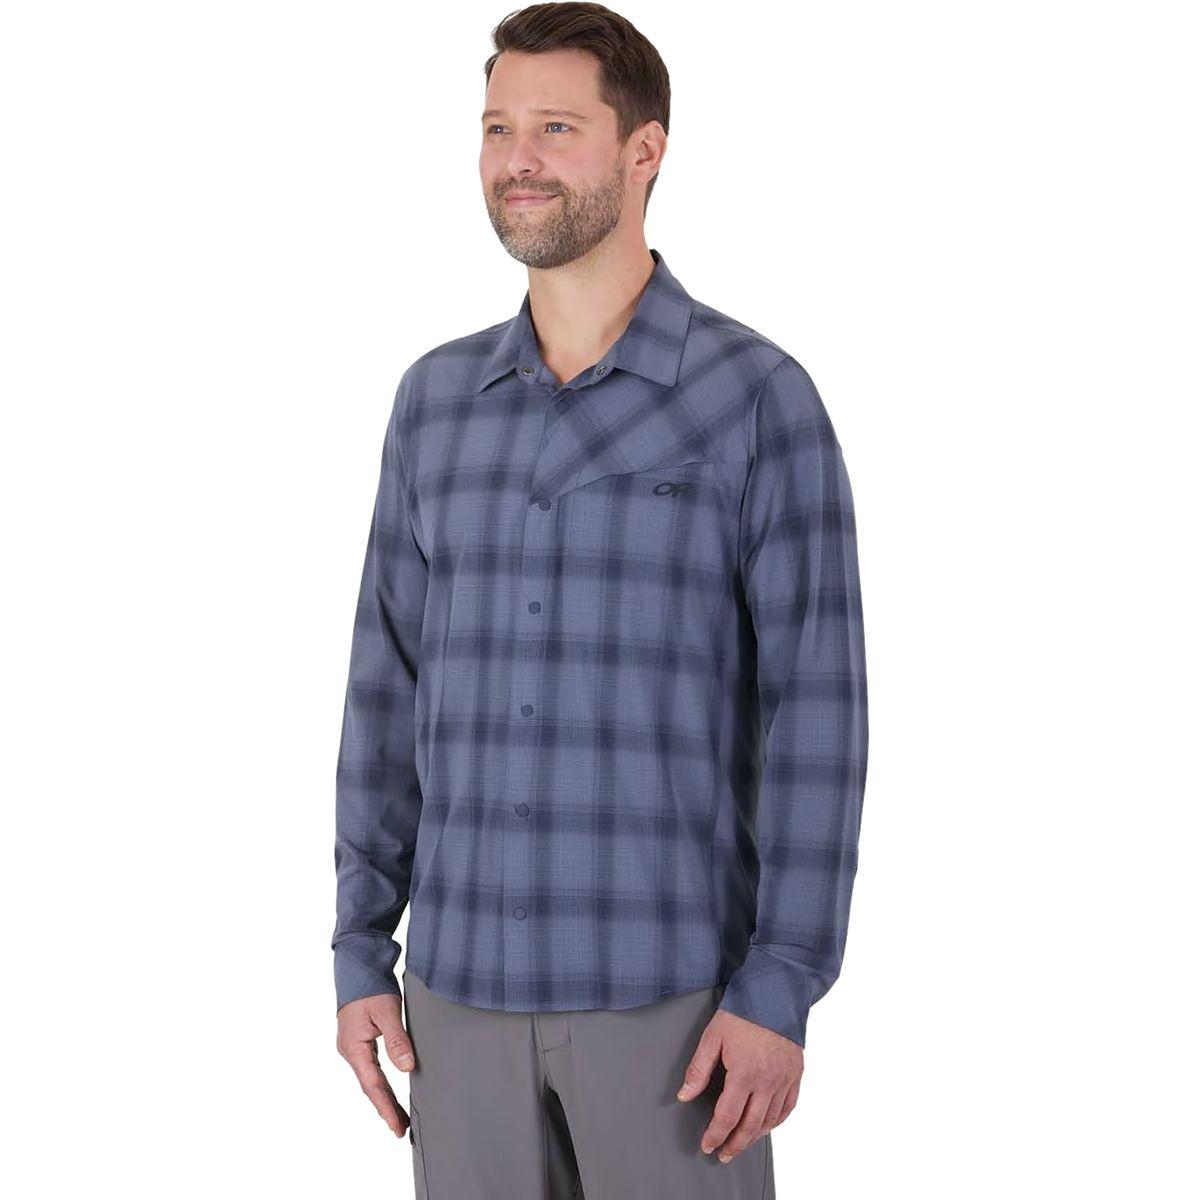 Outdoor Research Astroman L/S Sun Shirt